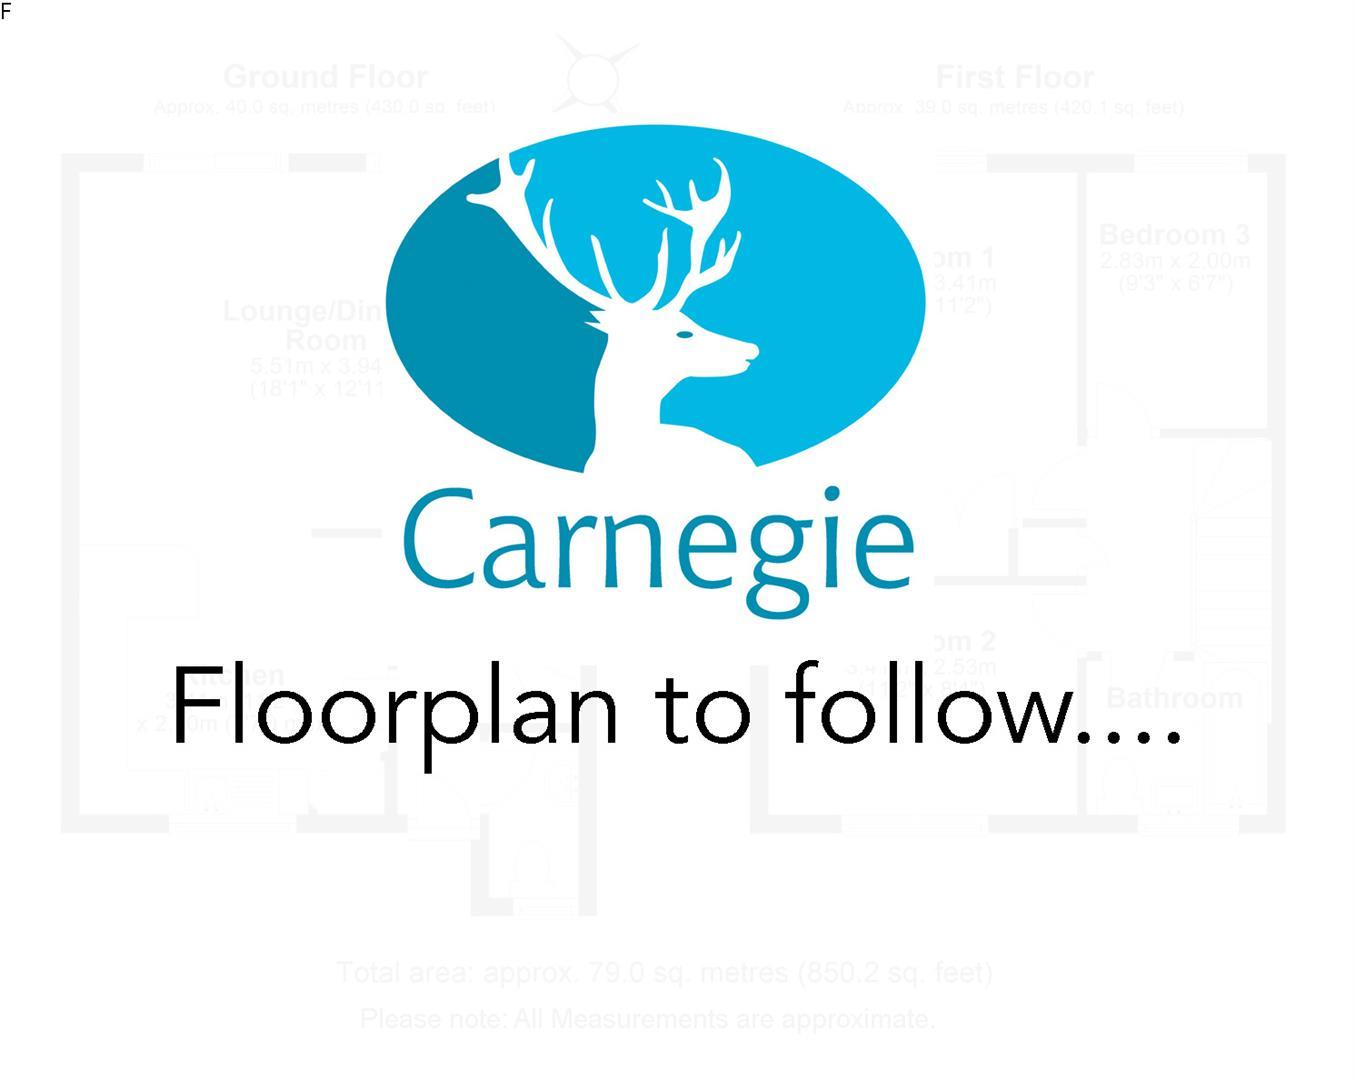 Floorplan to follow.jpg